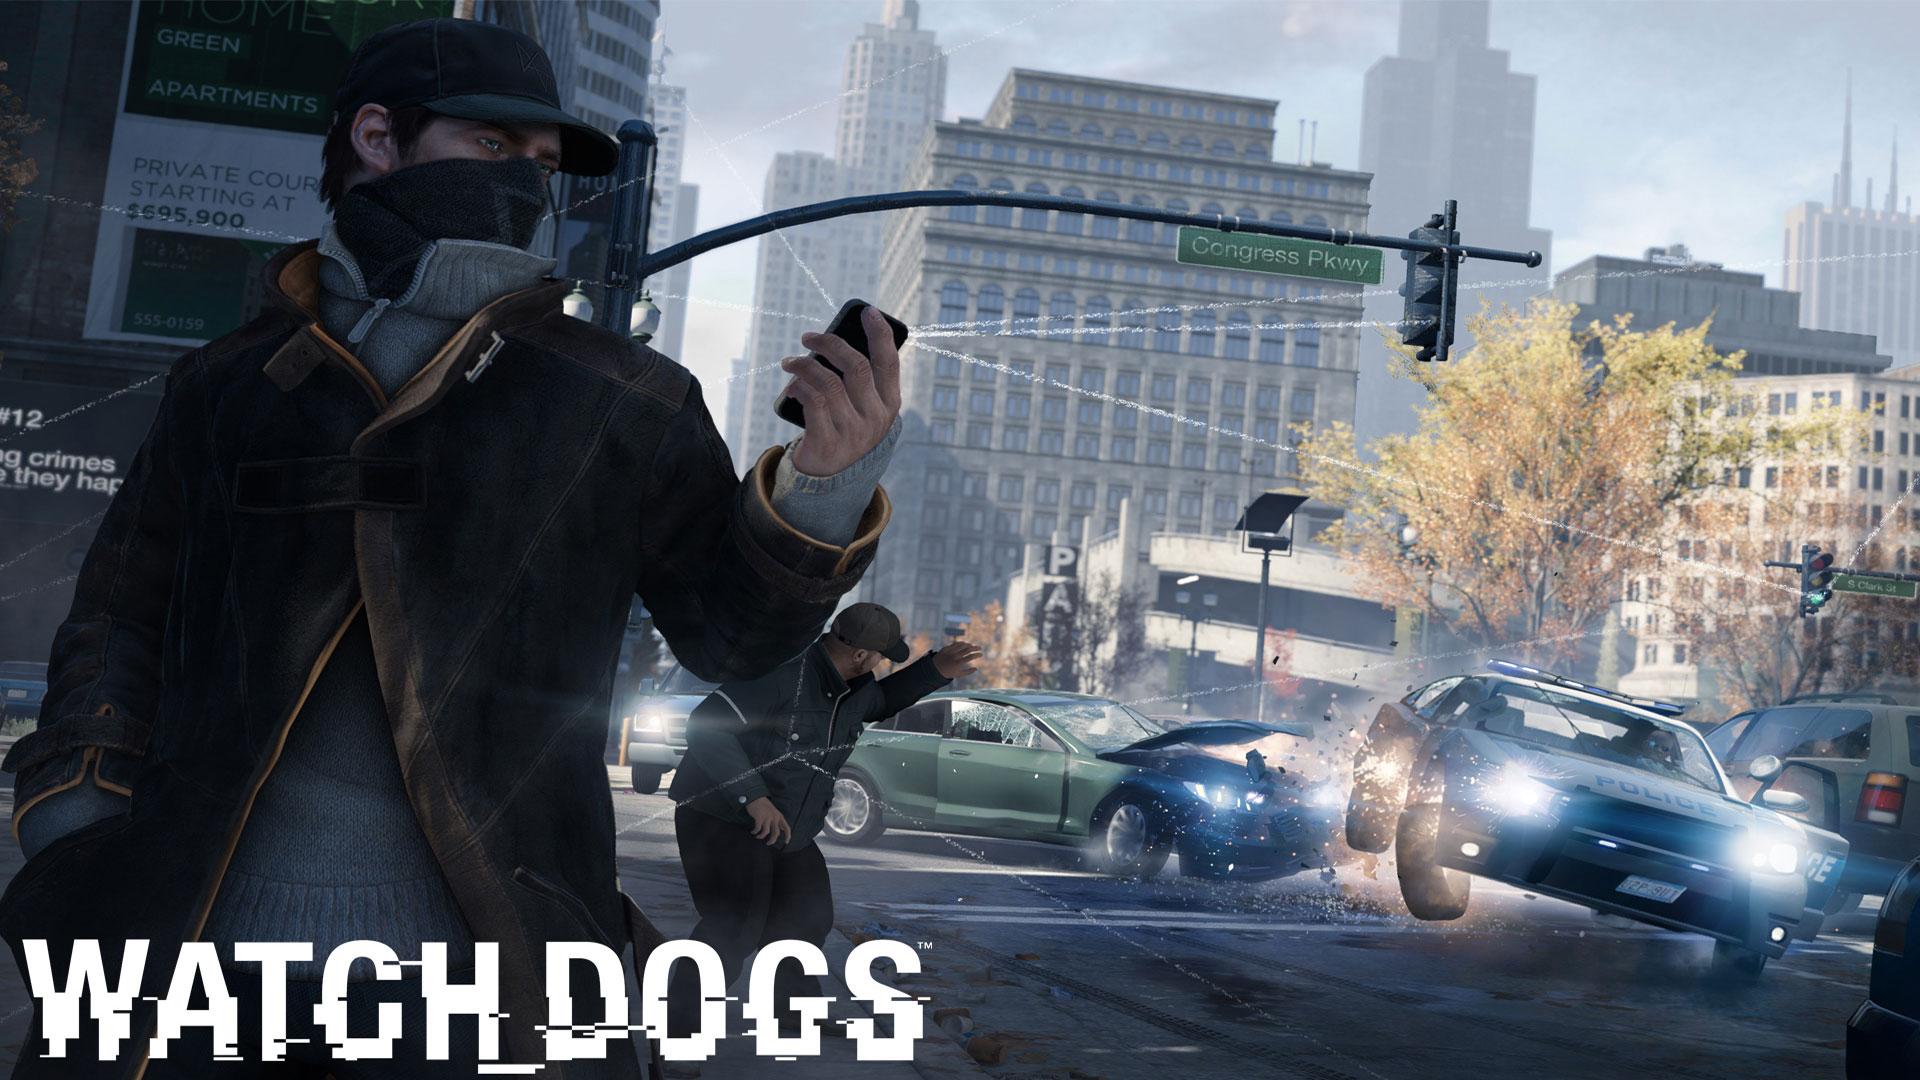 Free Download Watch Dogs Wallpaper Hd Wallpaper Photo 1080p